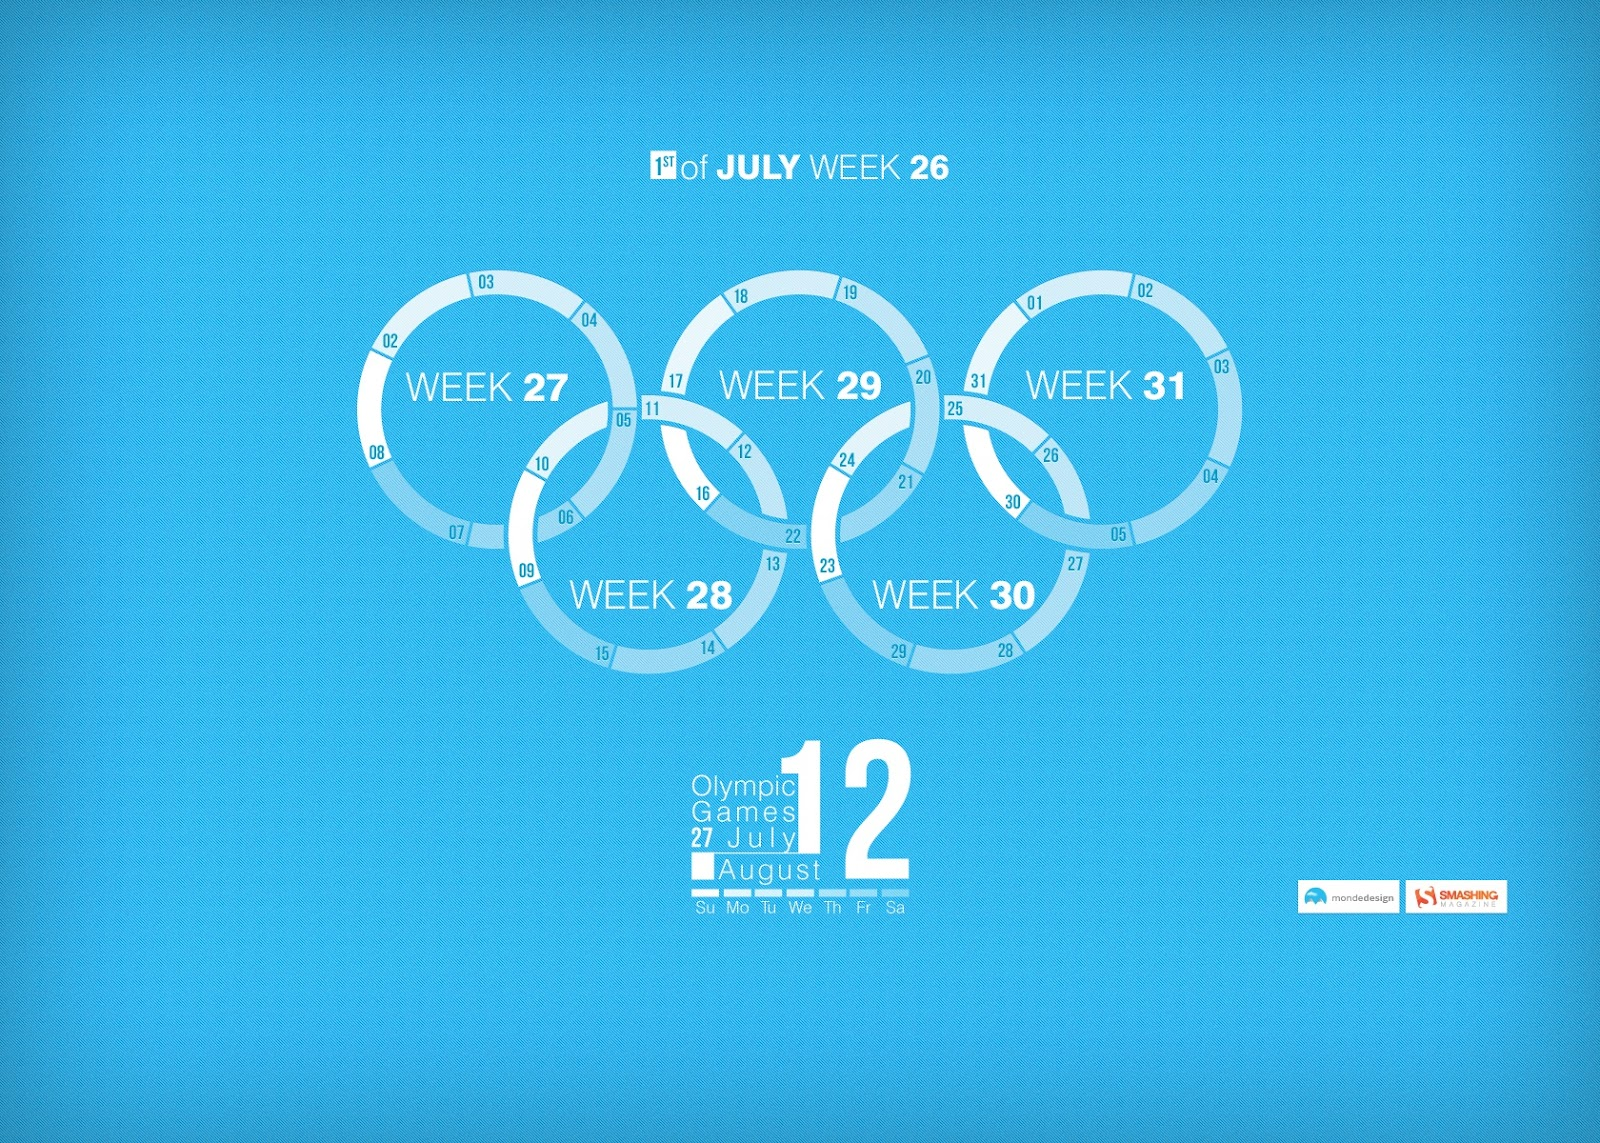 http://2.bp.blogspot.com/-ZdZityV8Wmk/T_HFGsOrVlI/AAAAAAAACYI/AAIP-9Un1mc/s1600/July+Olympics+Desktop+Wallpaper+Smashing+Magazine.jpg